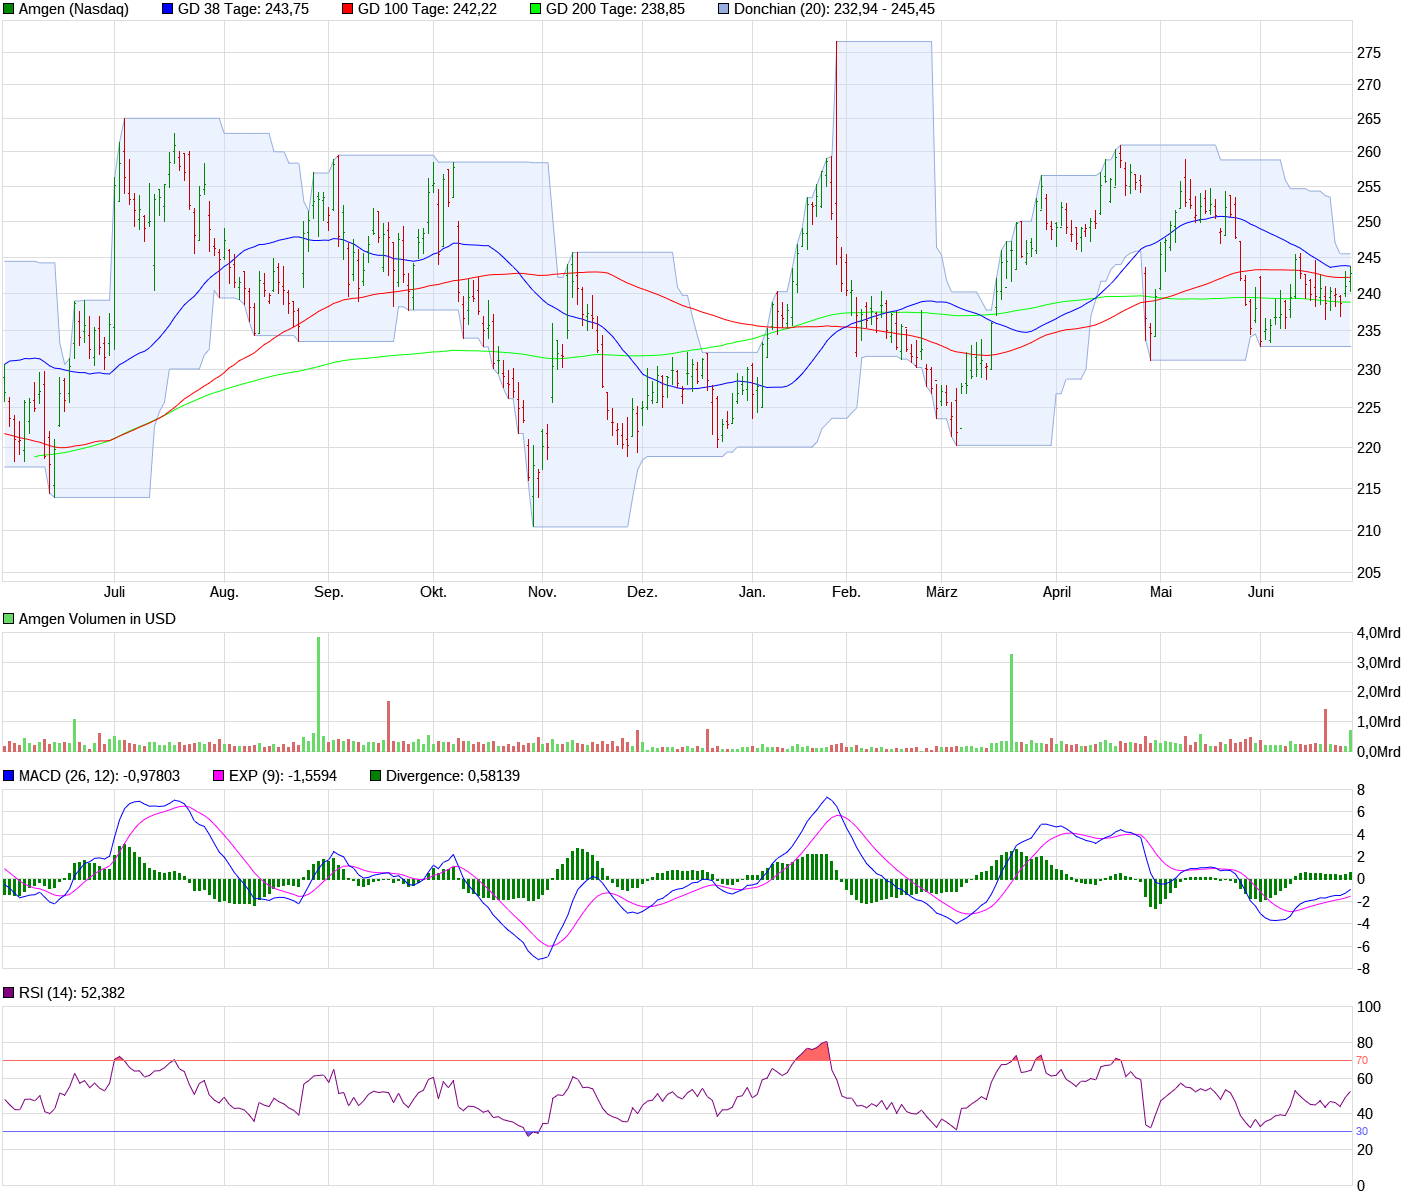 chart_year_amgen.png